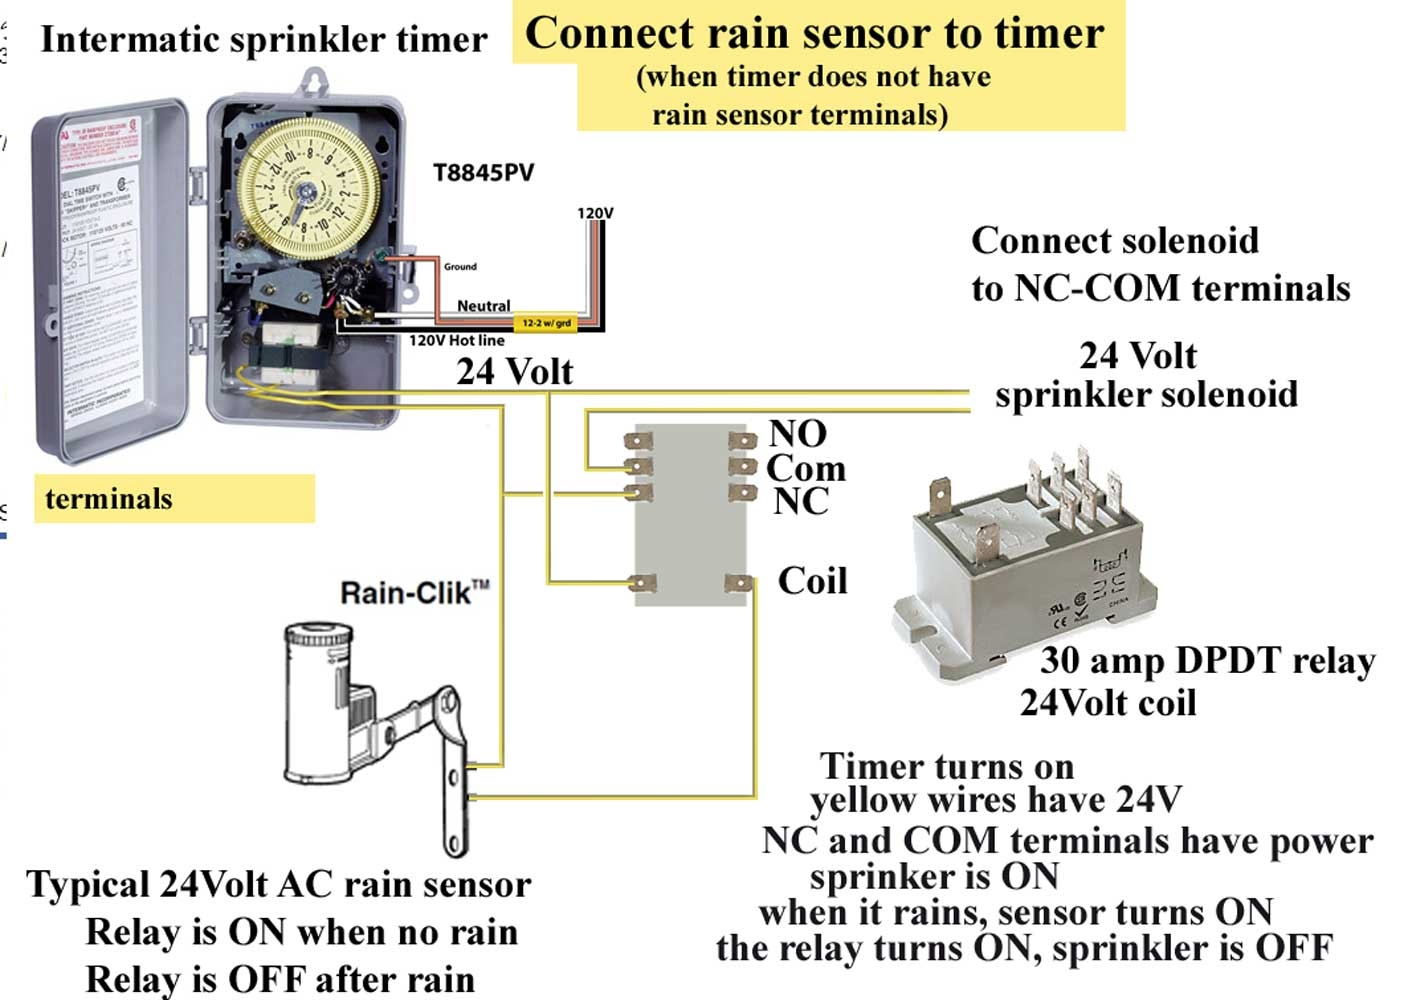 rainbird sprinkler wiring diagram free wiring diagram. Black Bedroom Furniture Sets. Home Design Ideas